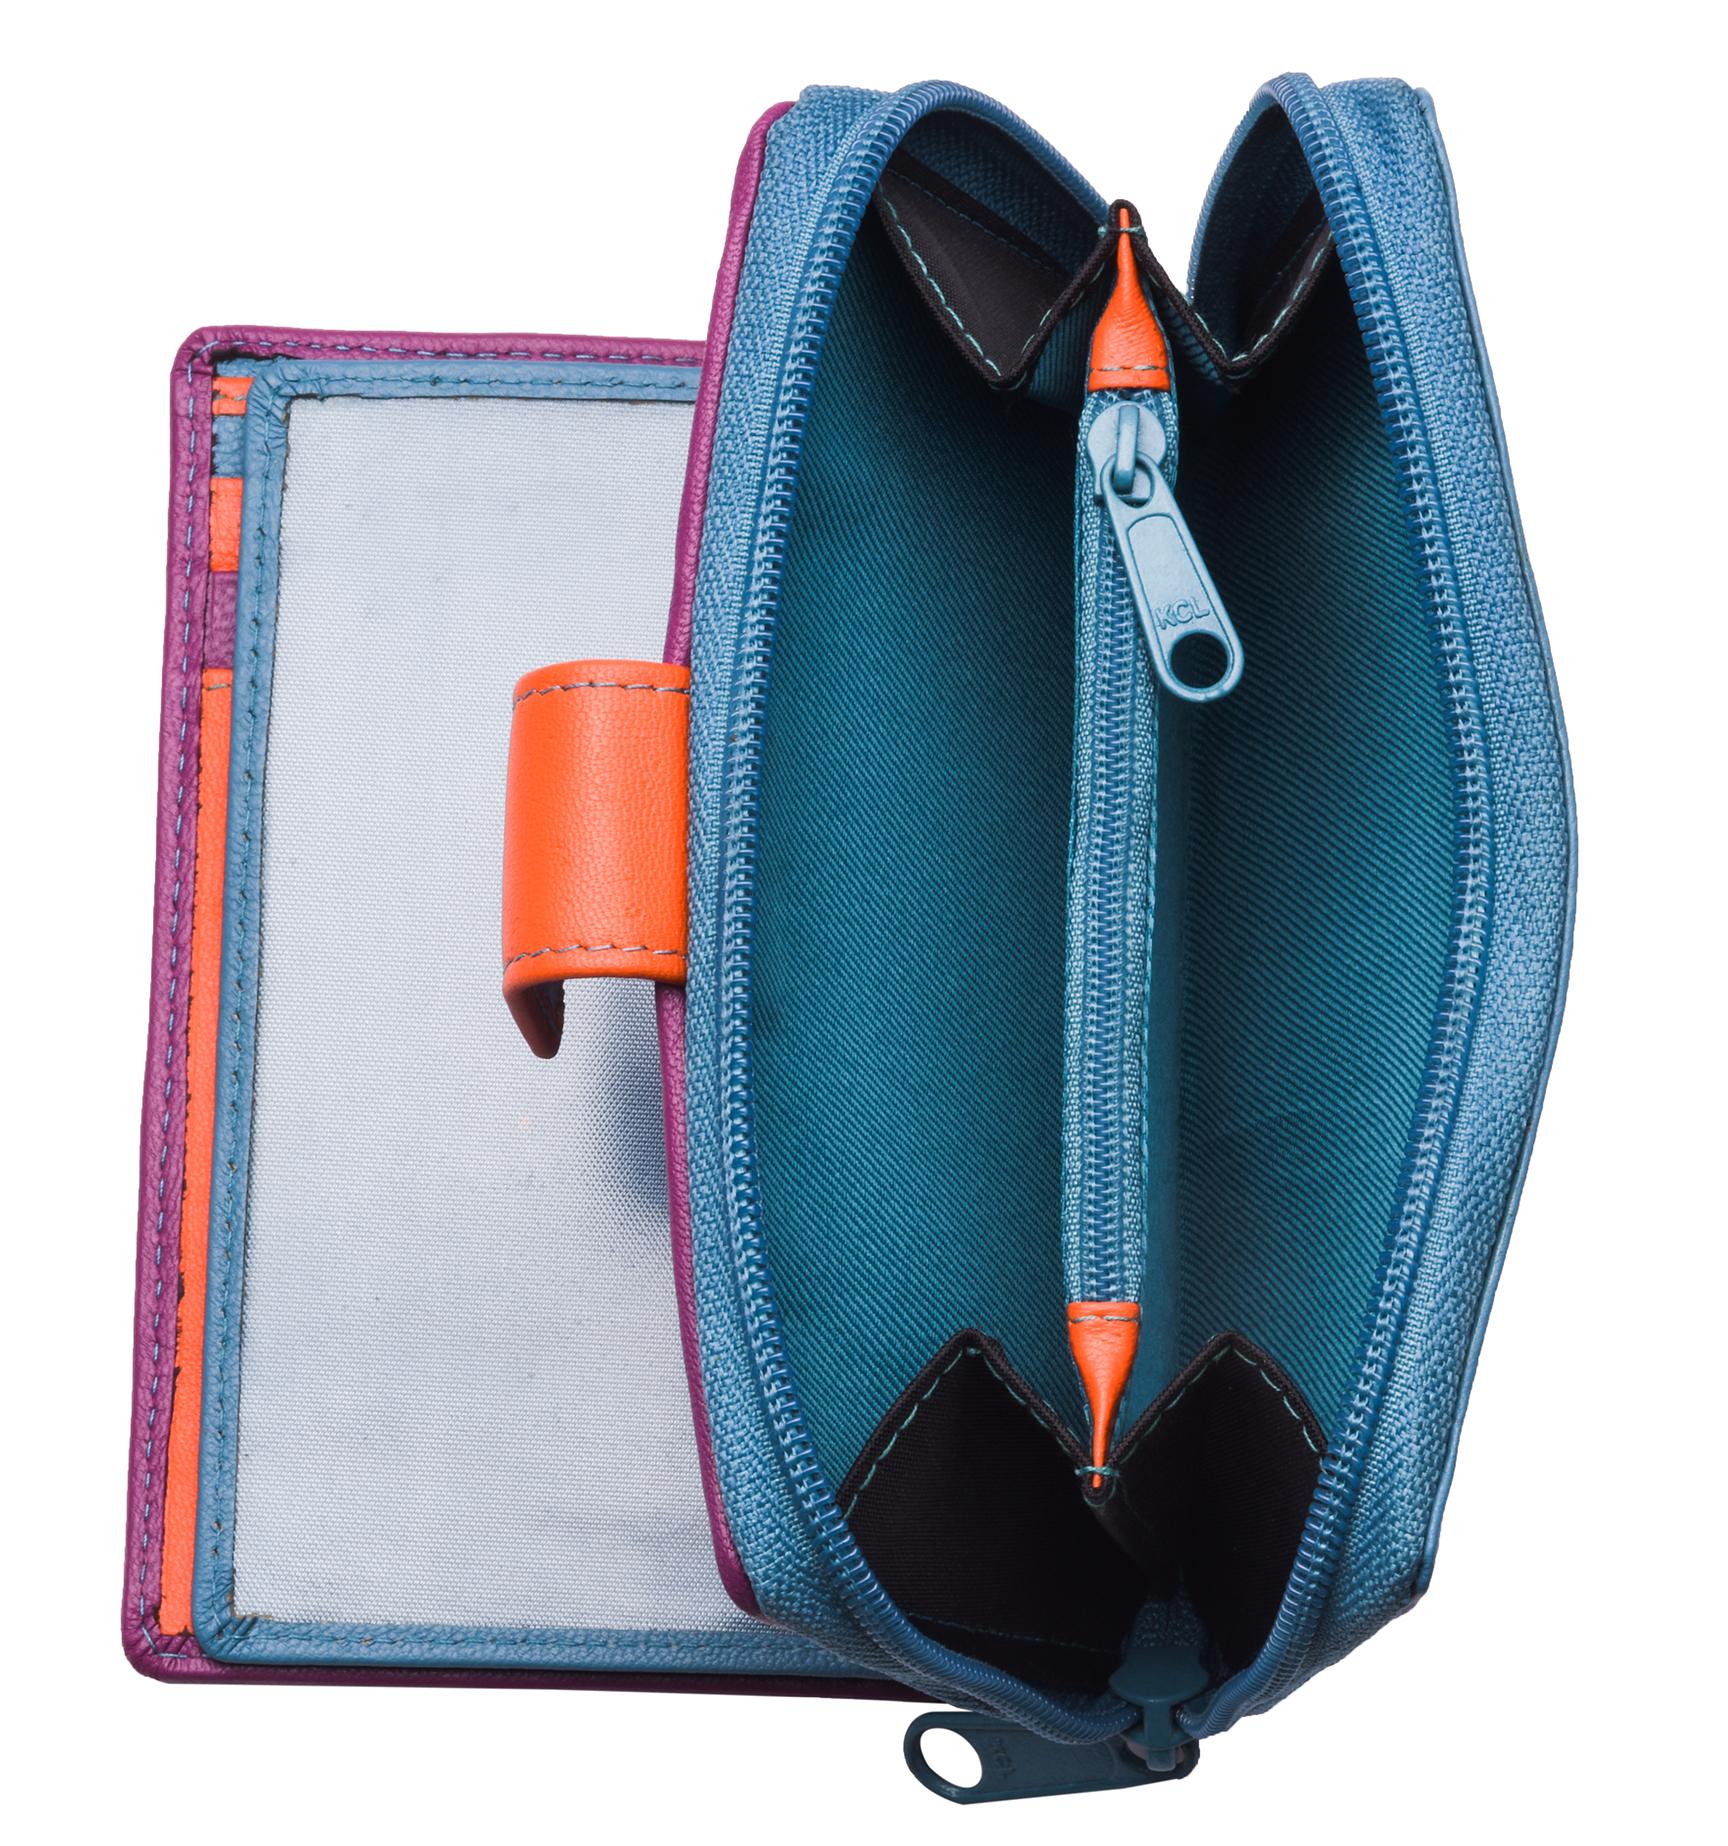 Ladies-Womens-RFID-Blocking-Safe-Leather-Bifold-Medium-Purse-Wallet-Coin-Section thumbnail 9